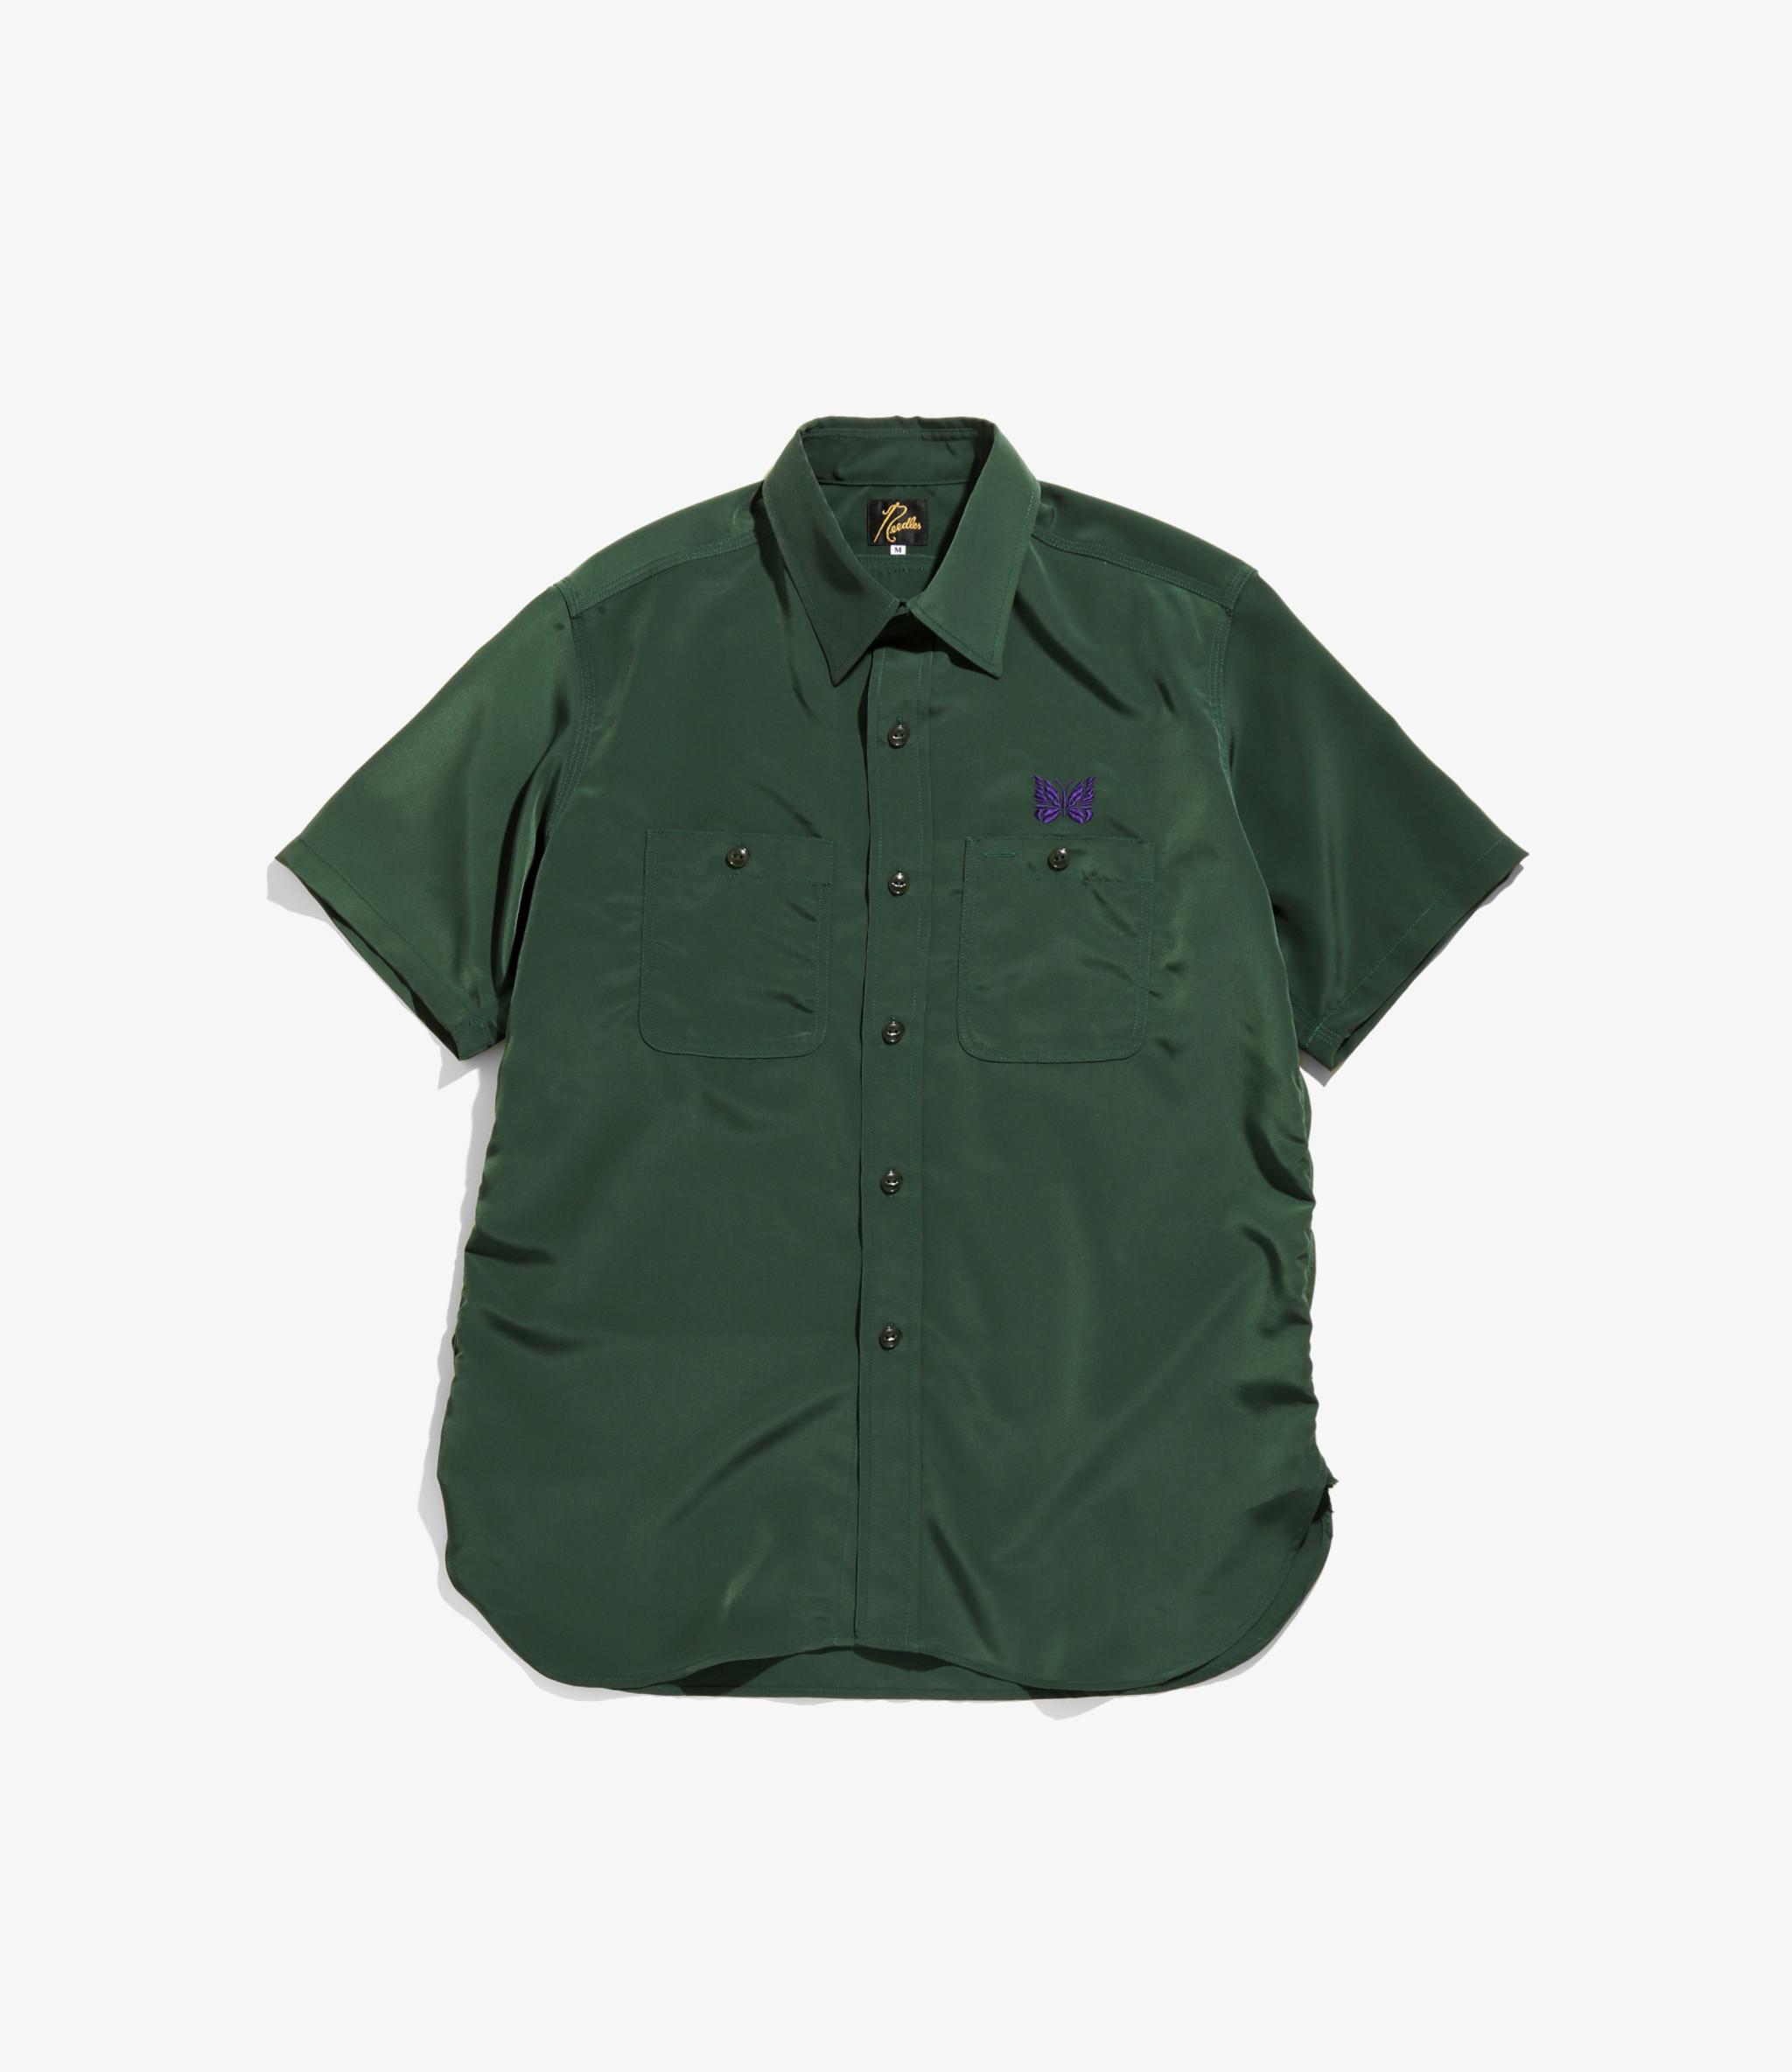 Needles Short Sleeve Work Shirt - Poly Cloth - Green